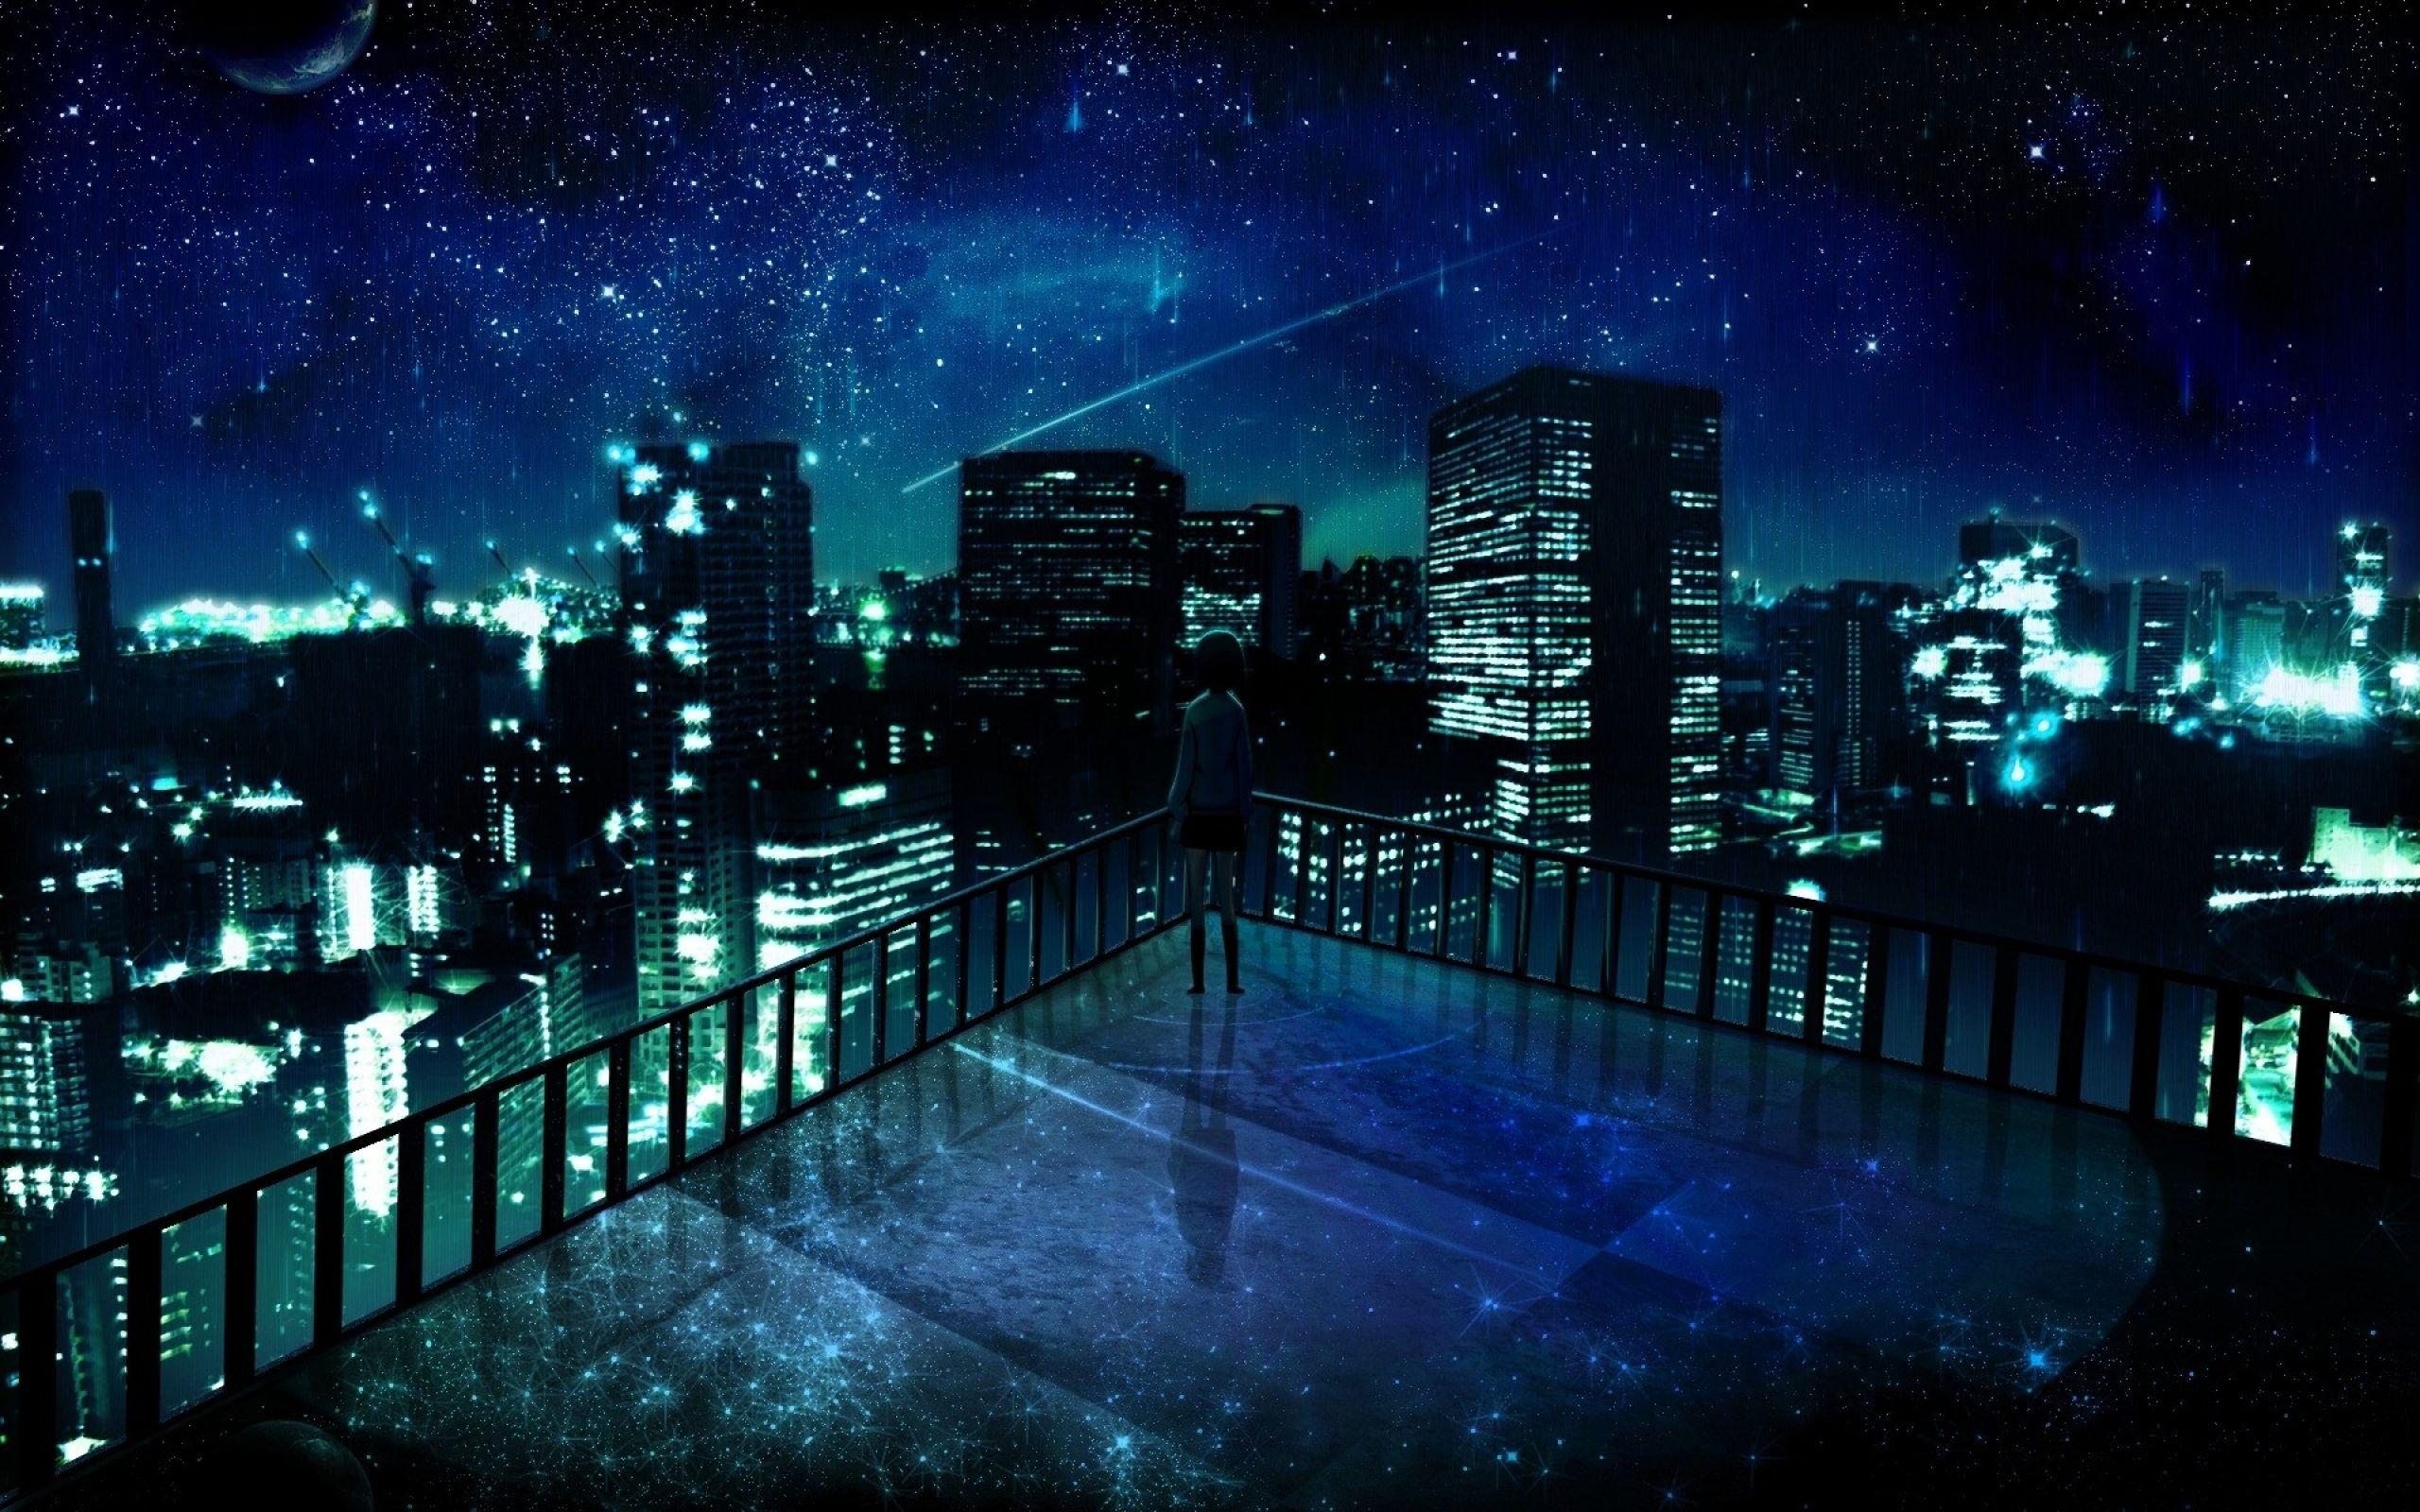 night city anime wallpaper desktop #72722 wallpaper | environment